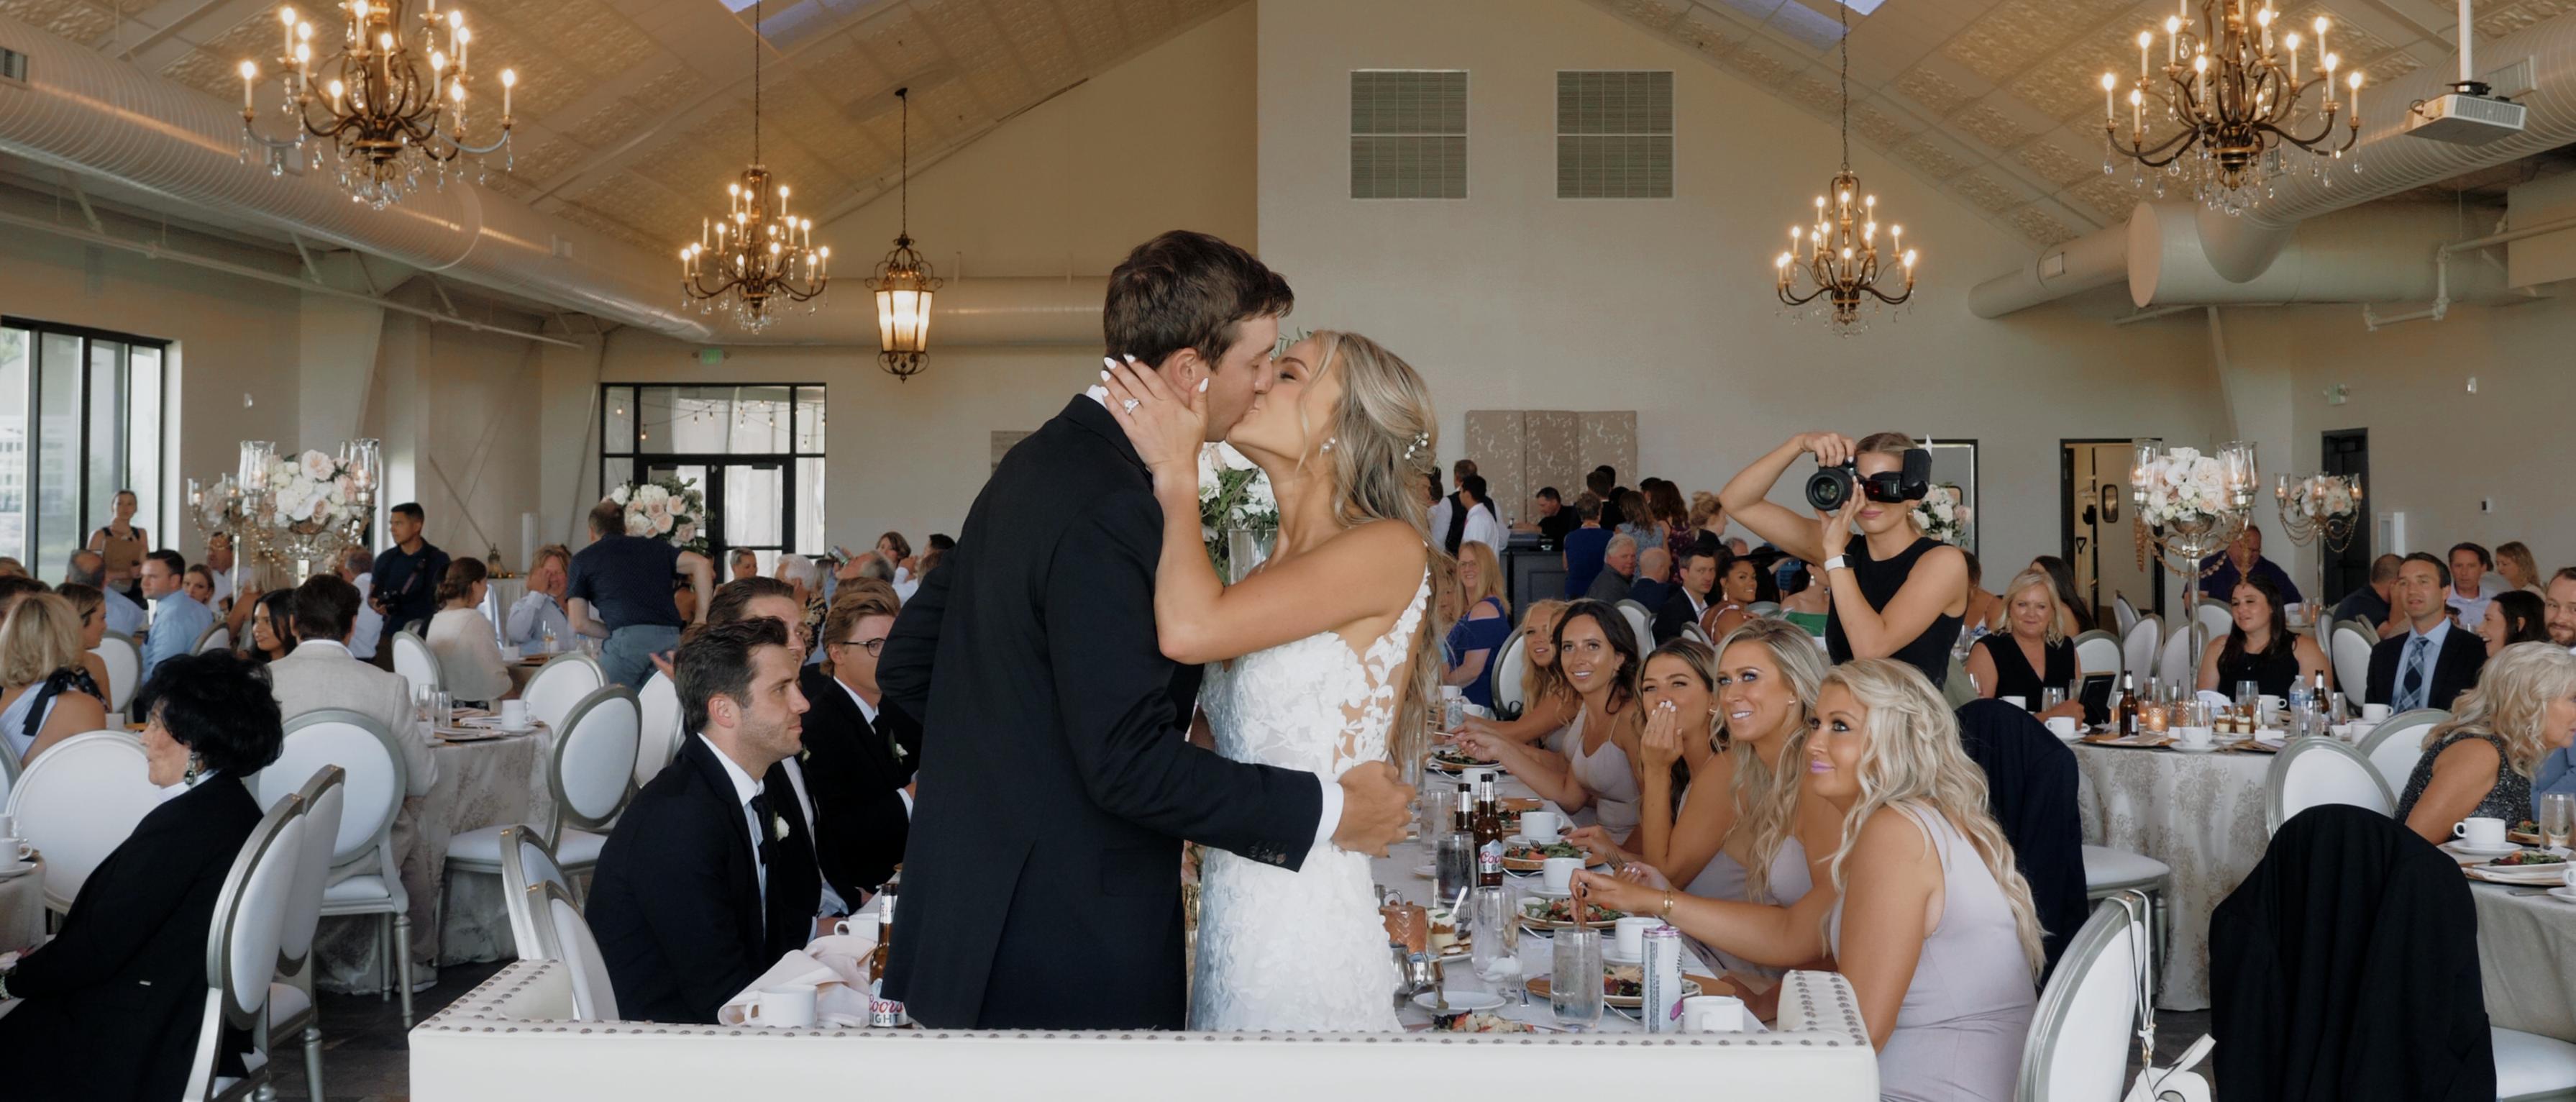 Couple kissing at elegant Christian Minnesota wedding